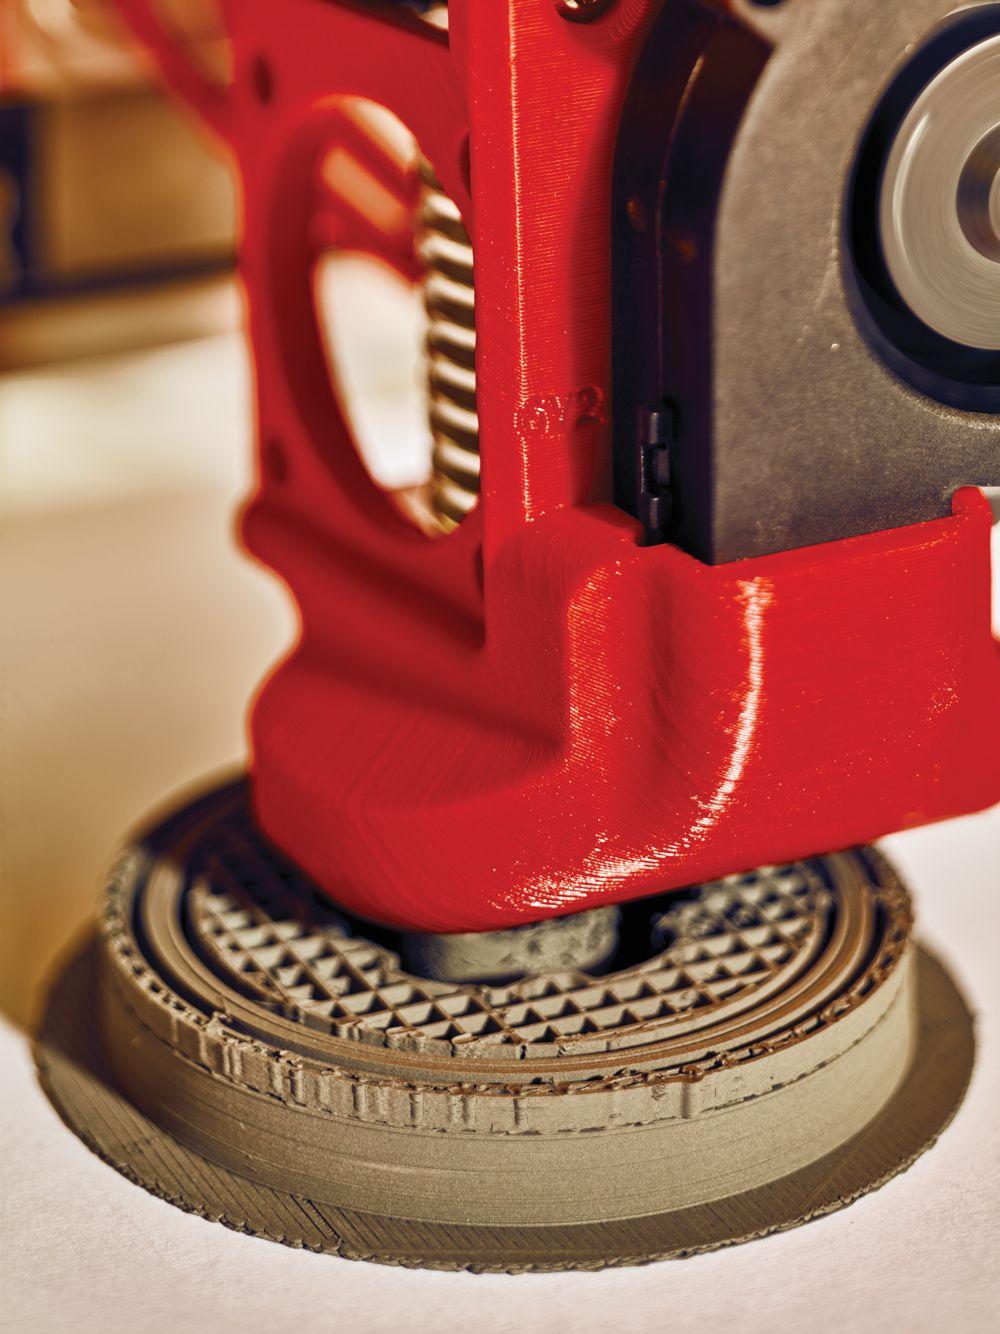 MIT教授陣が関わる 金属3Dプリンターが ついに登場